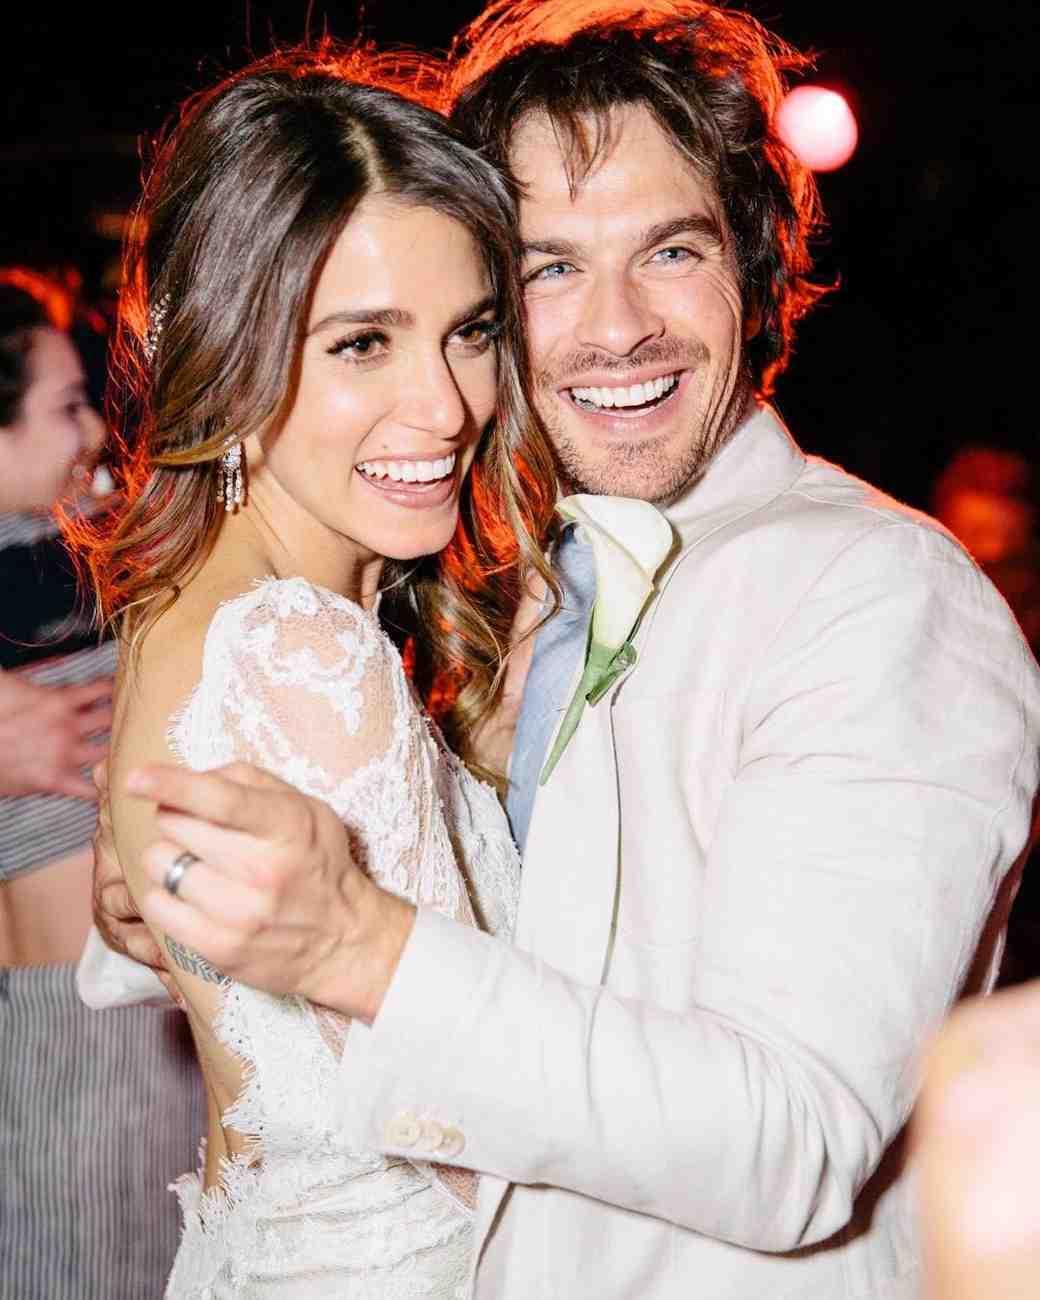 Nikki Reed and Ian Somerhalder on Their Wedding Day